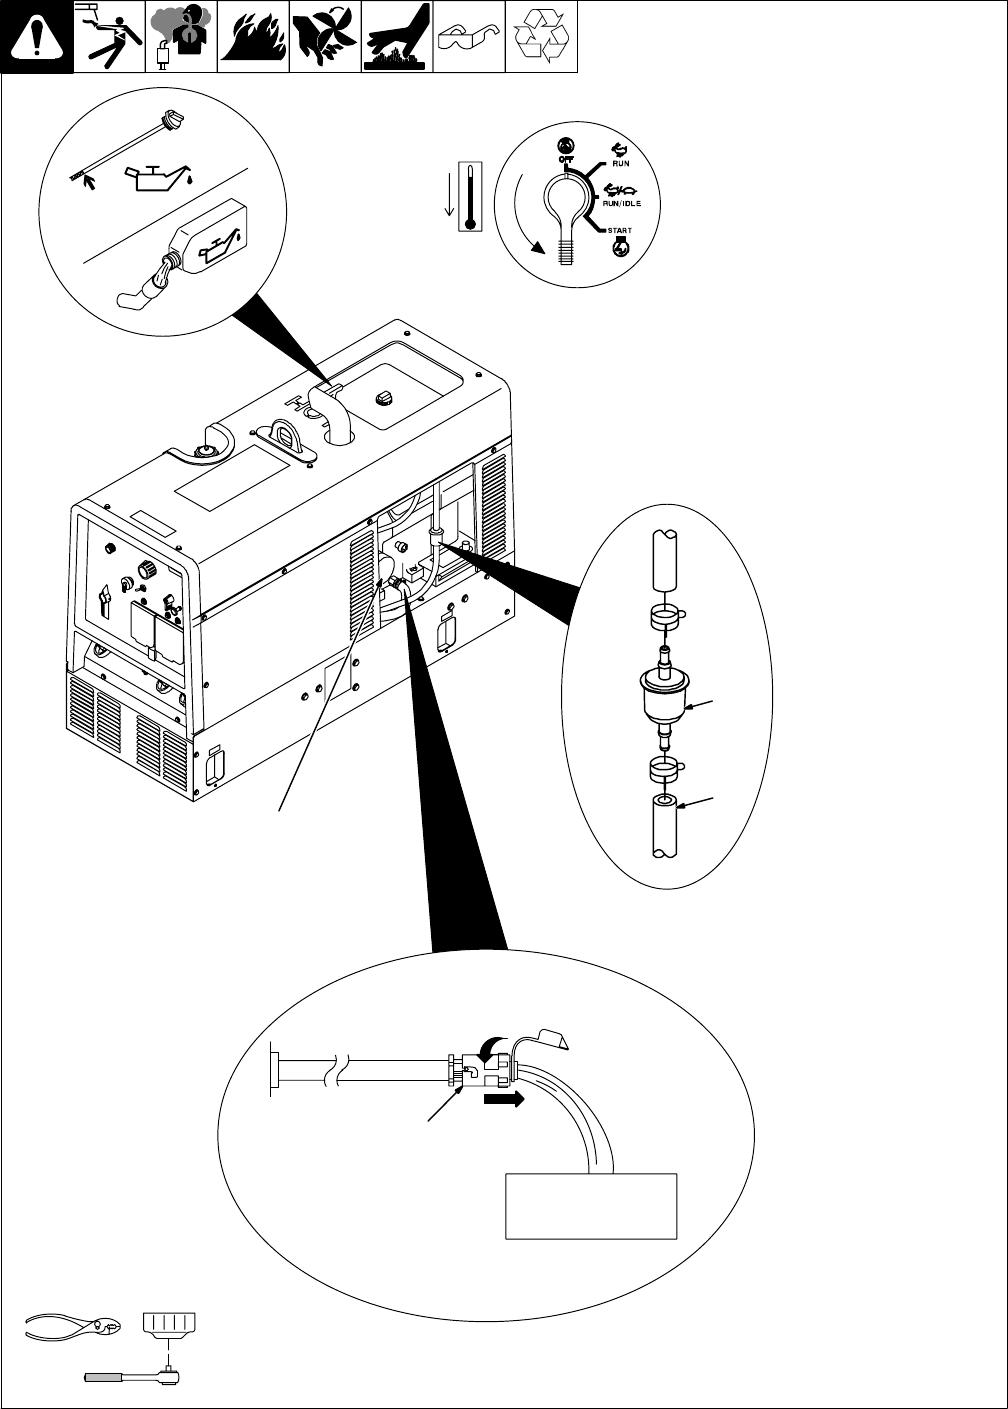 Miller Electric 301 G, DC, Trailblazer DC 9-5. Changing Engine Oil, Oil  Filter, And Fuel Filter (Kohler-Powered Units)Manuals